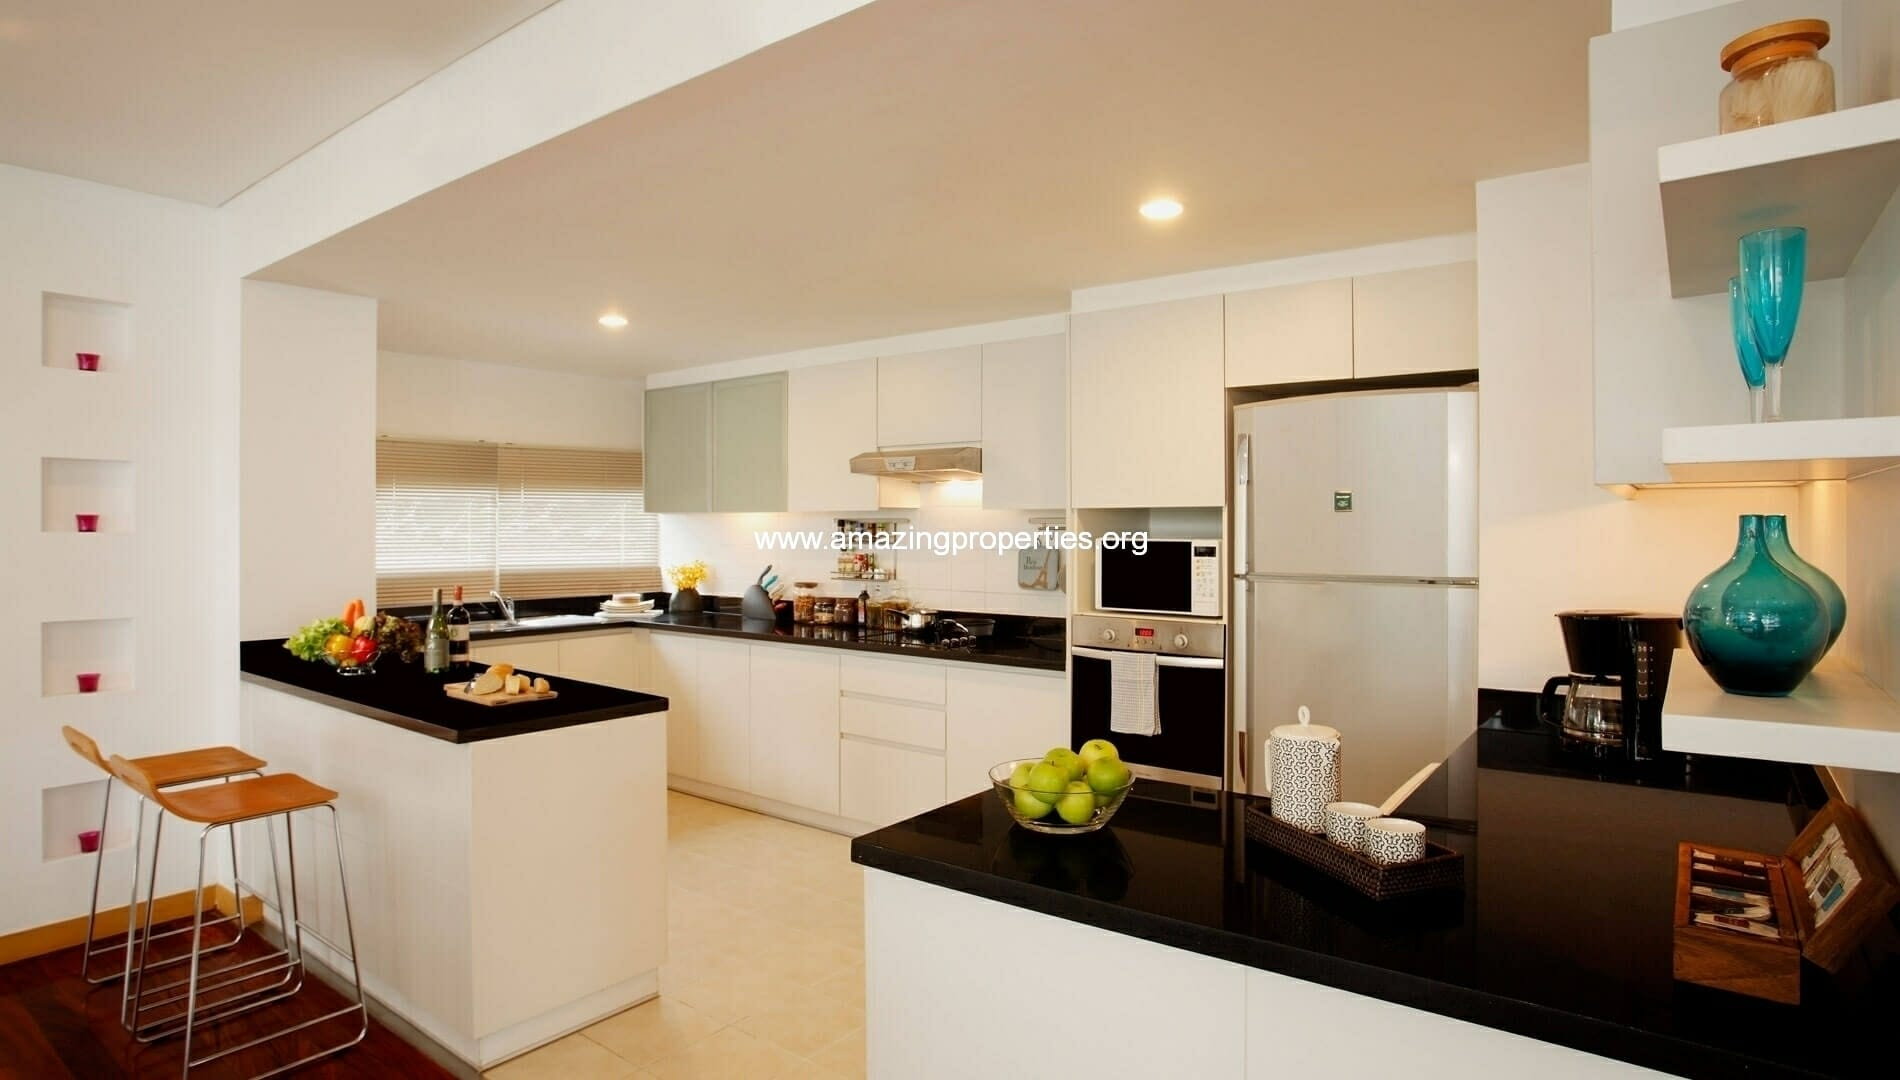 Ekkamai Gardens 3 bedroom kitchen